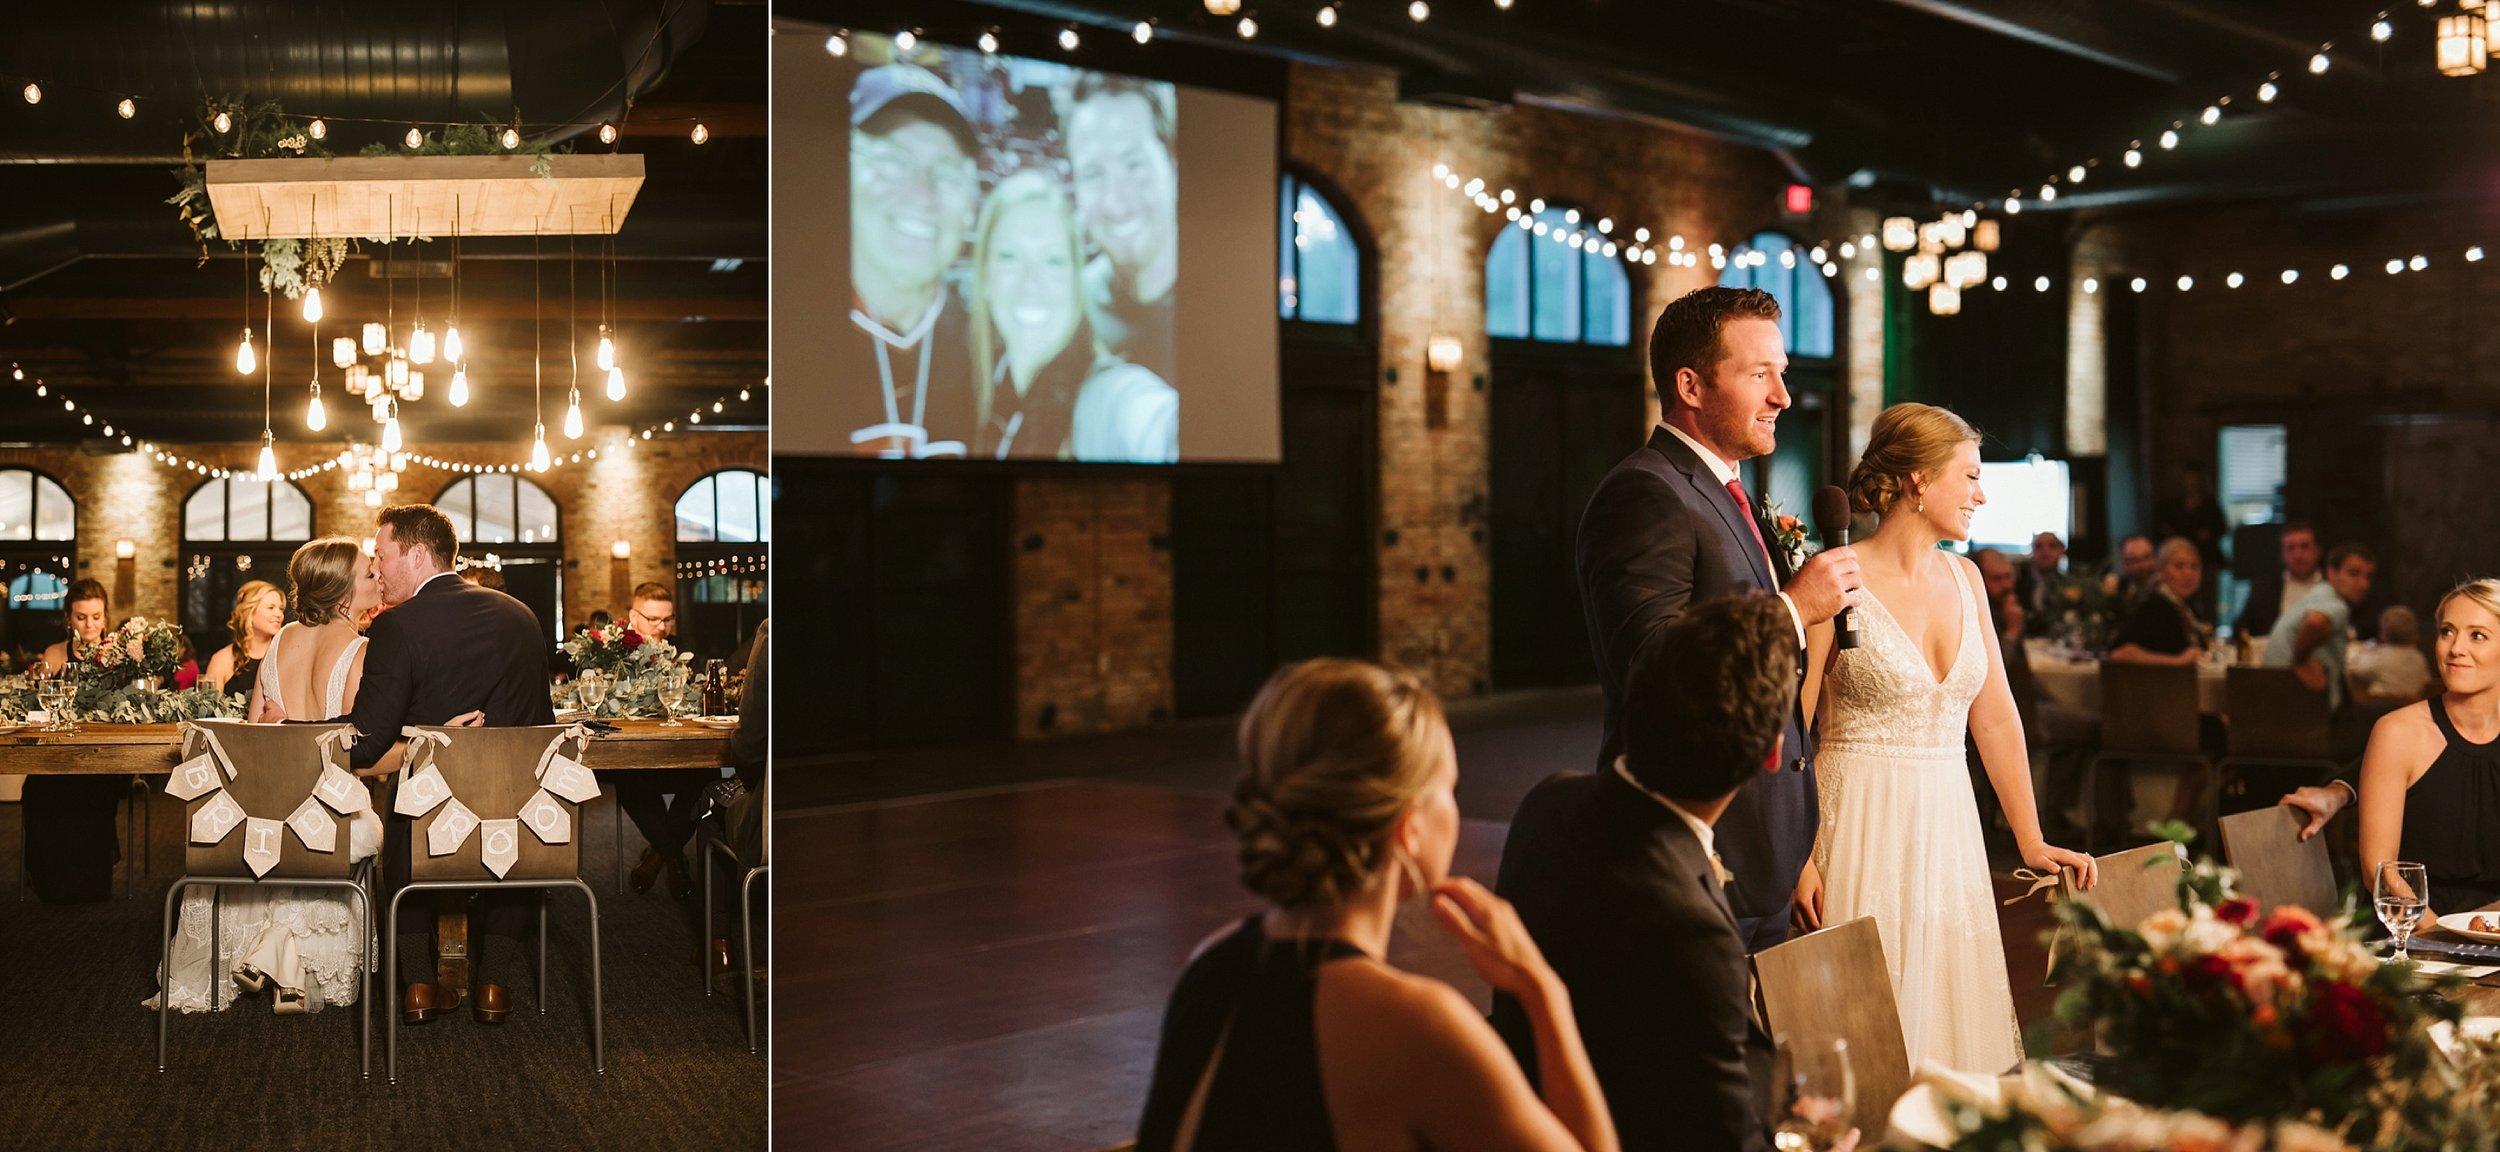 Nicollet-Island-Pavilion-Minneapolis-September-Coral-Navy-Wedding-143.jpg